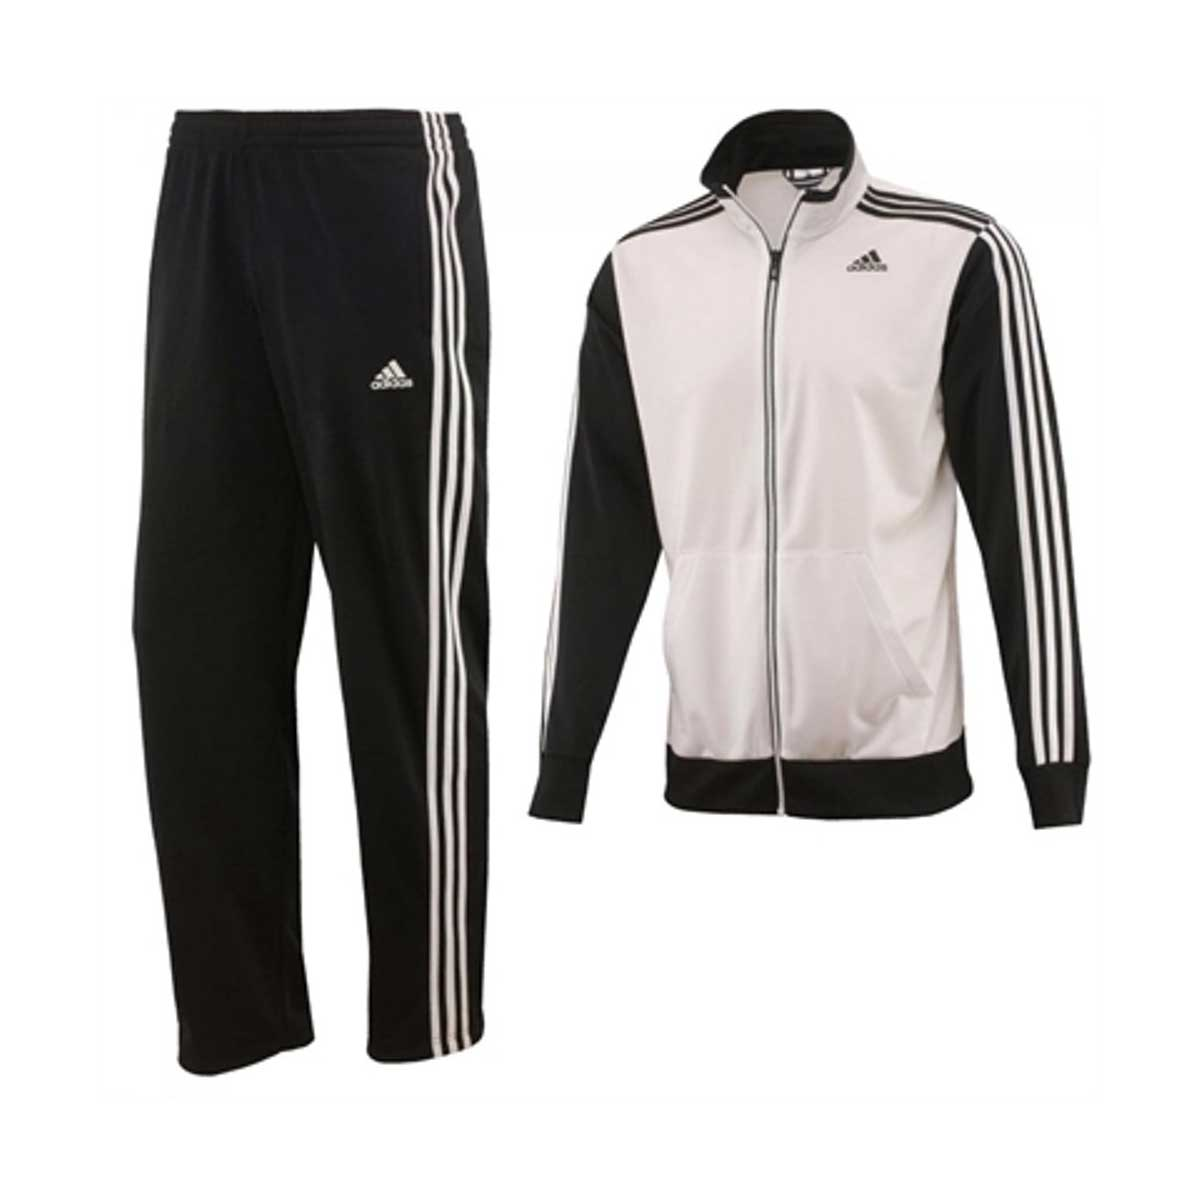 buy adidas joggers